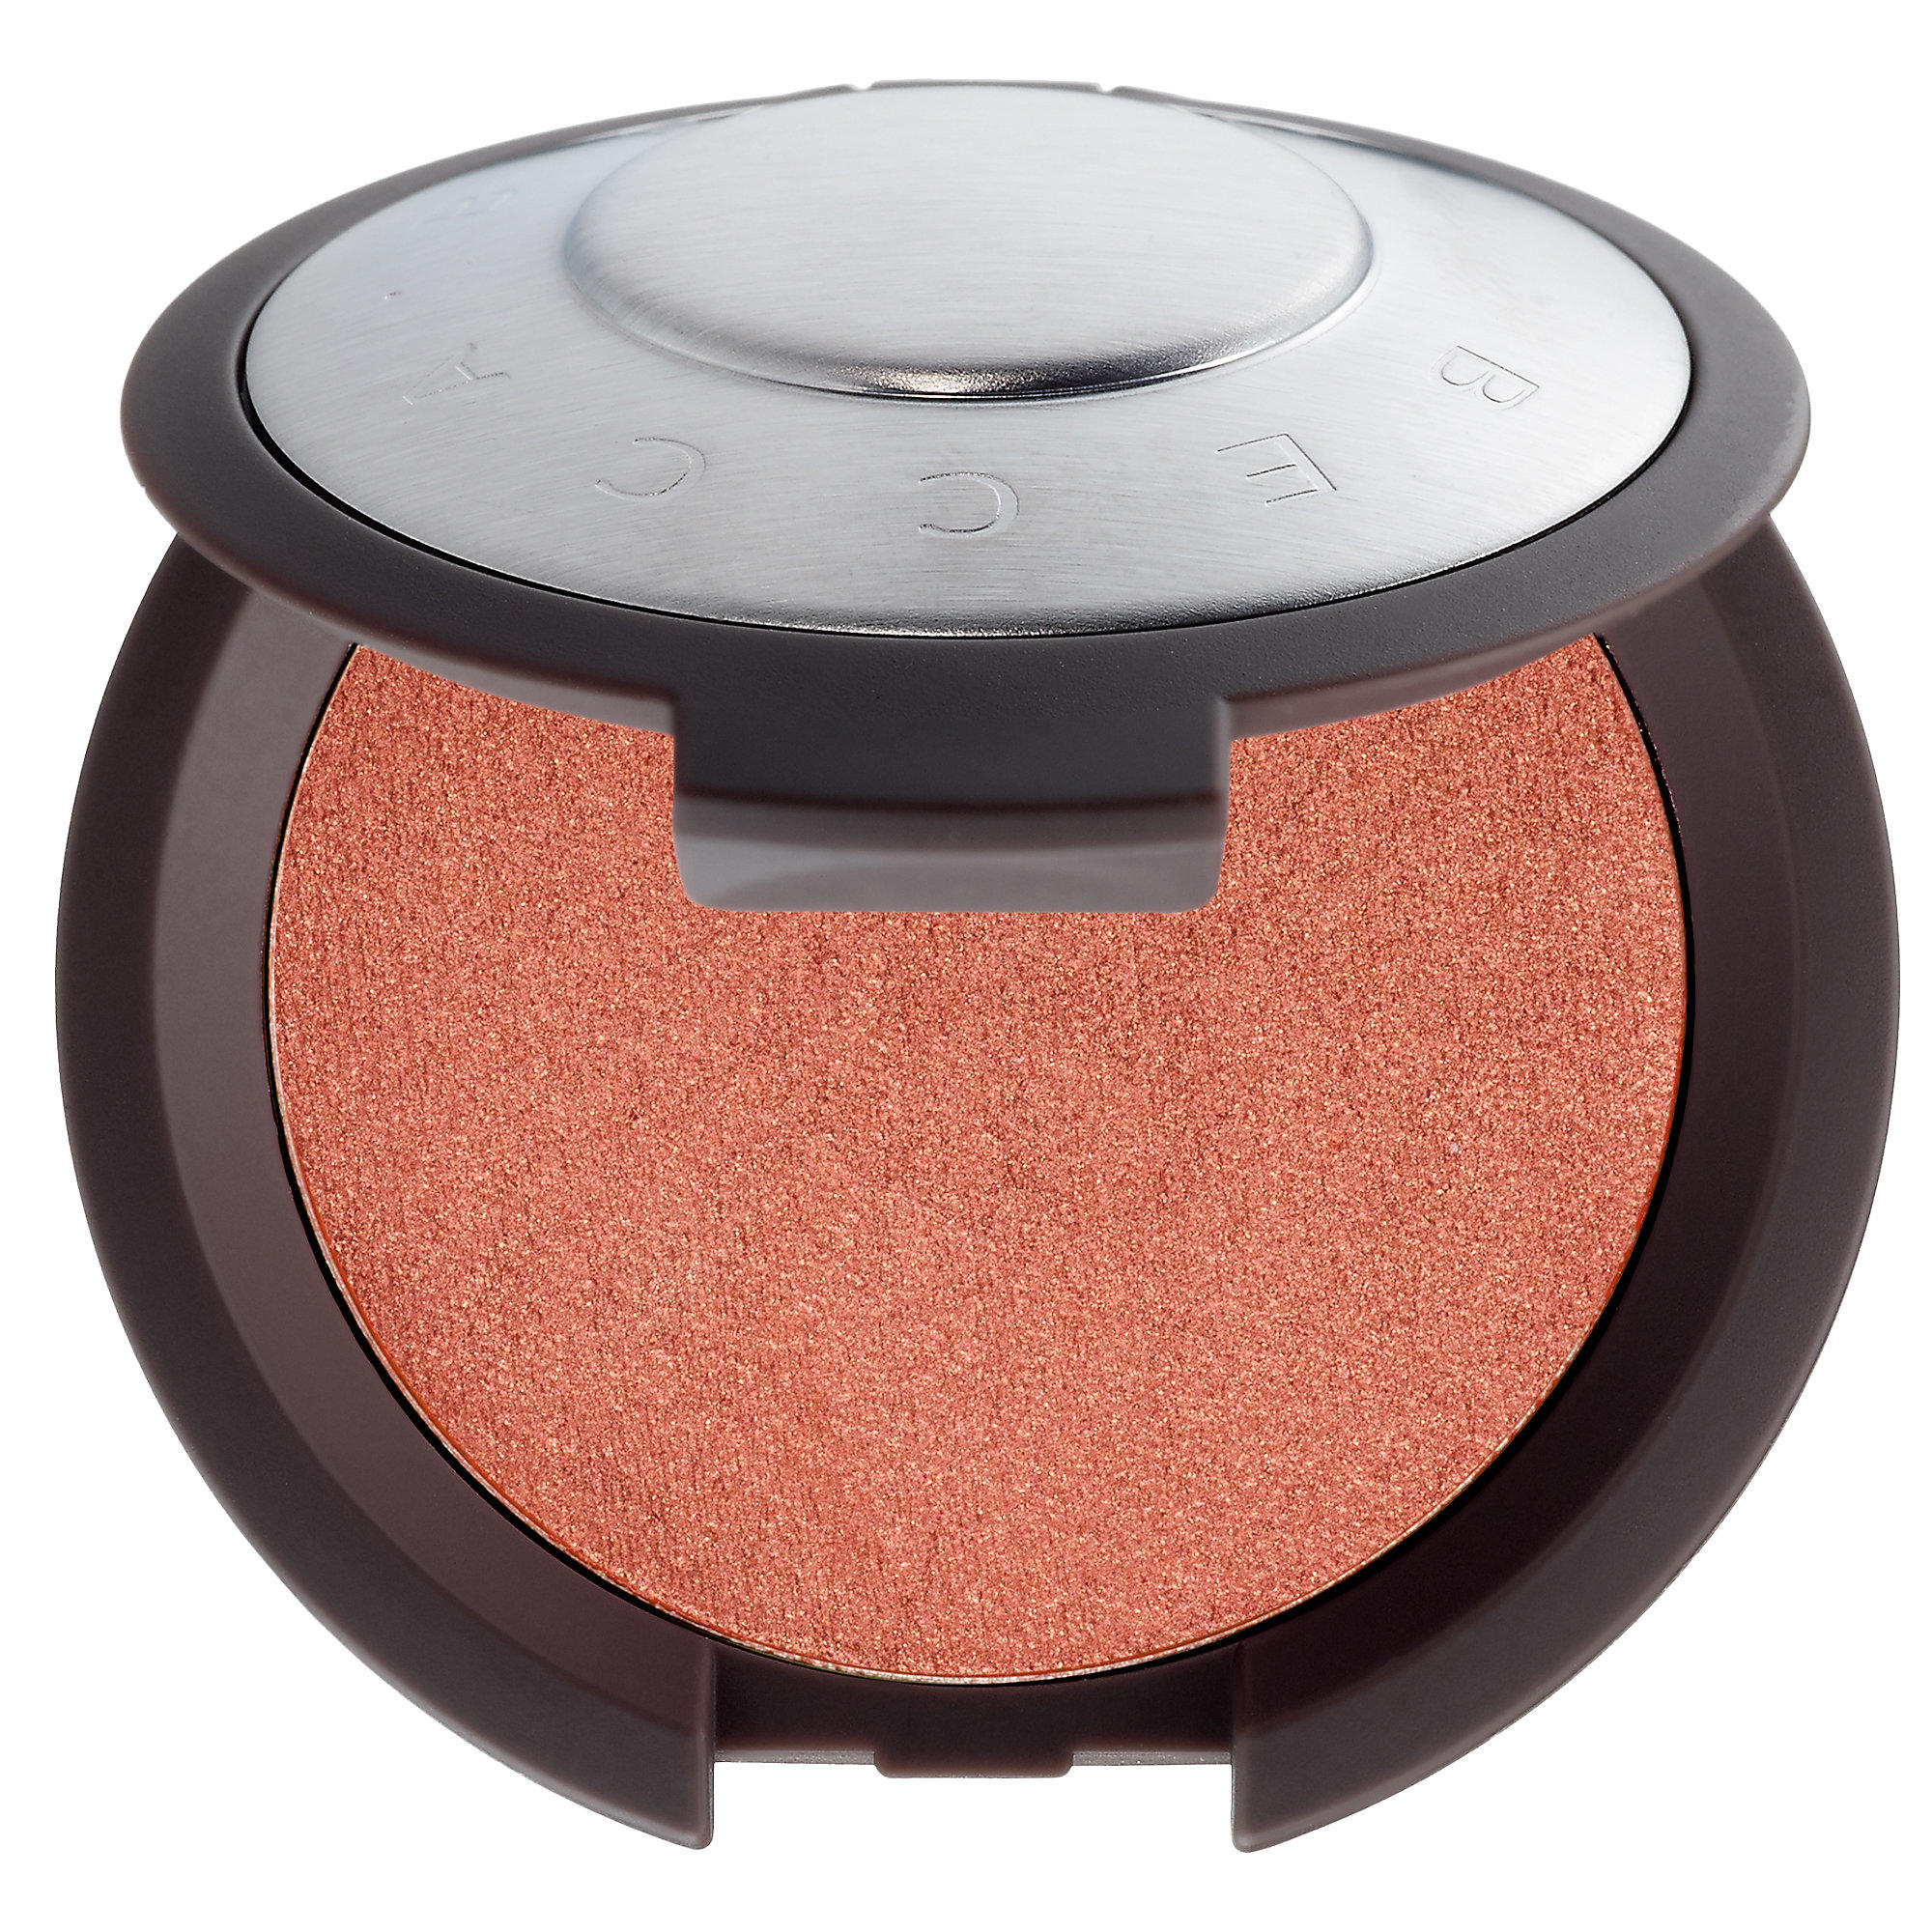 BECCA Shimmering Skin Perfector Luminous Blush Blushed Copper